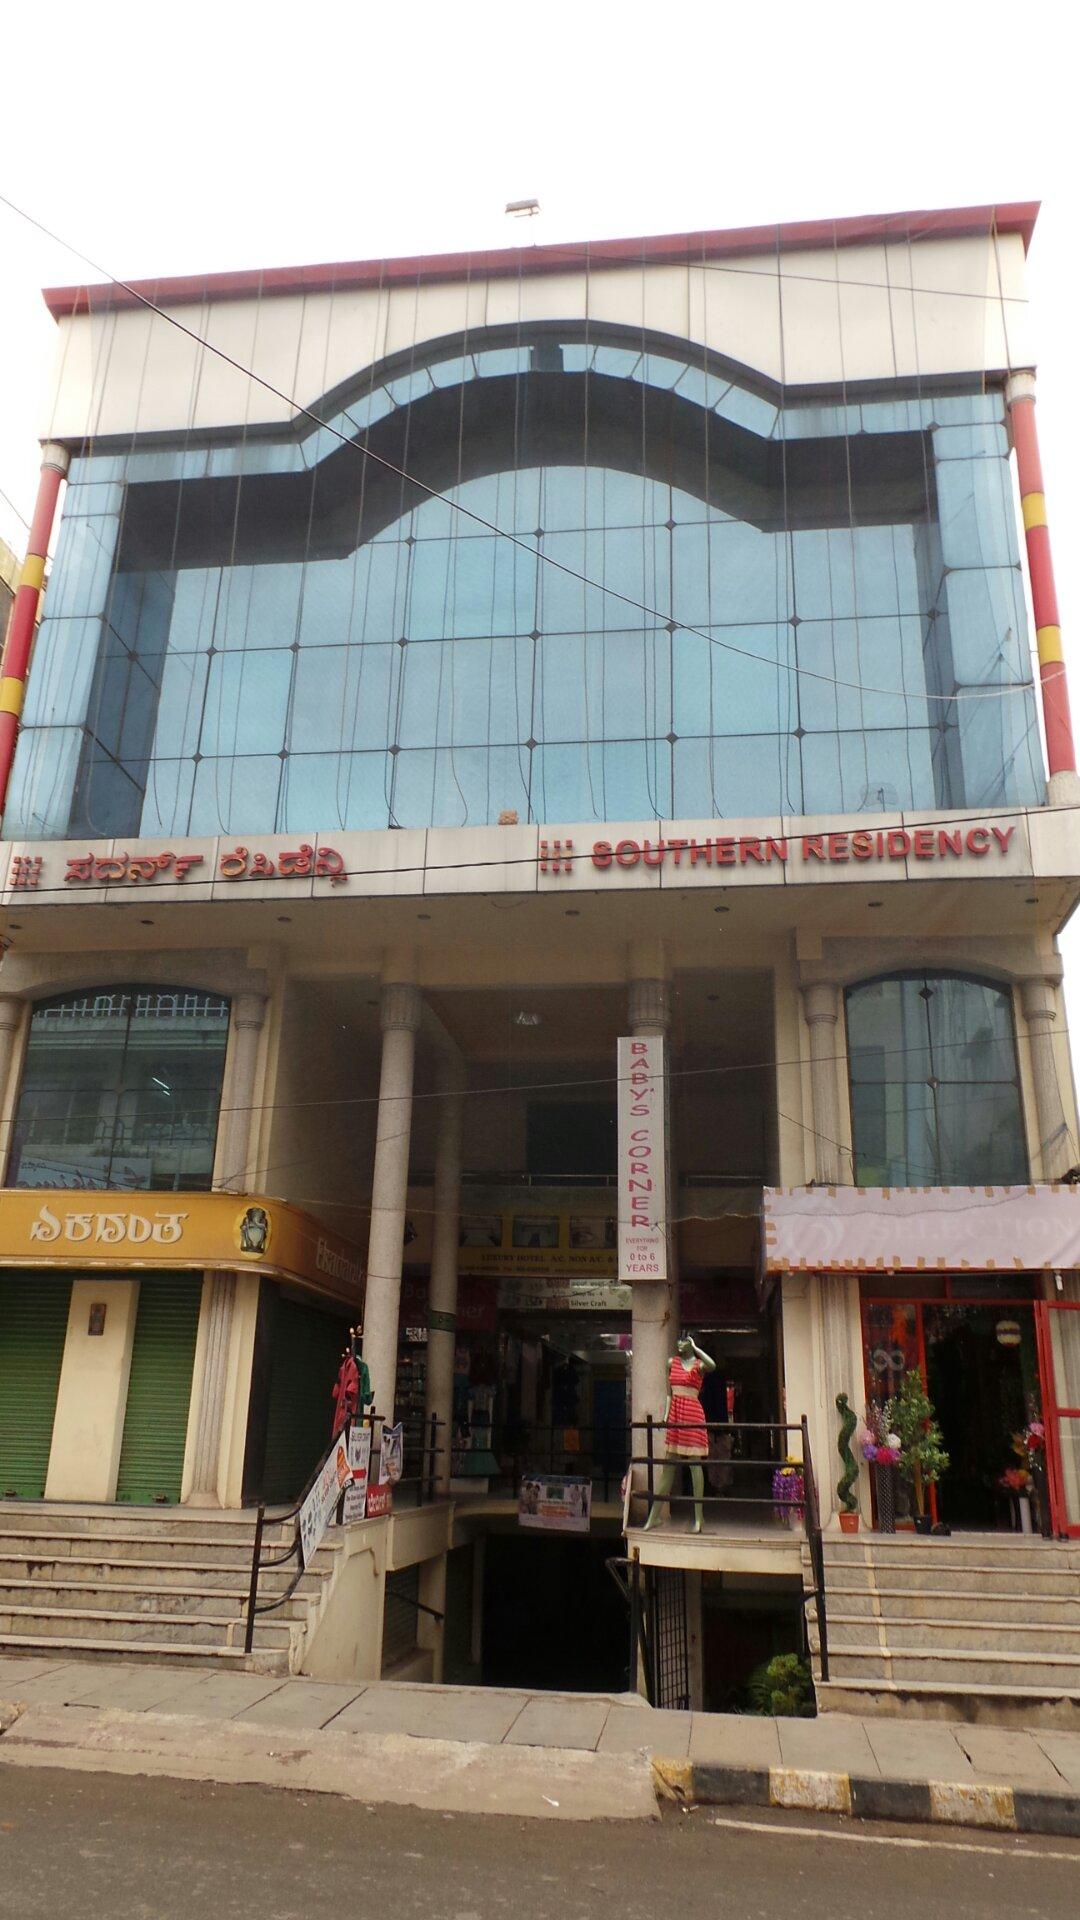 Southern Residency Basavanagudi in Bengaluru